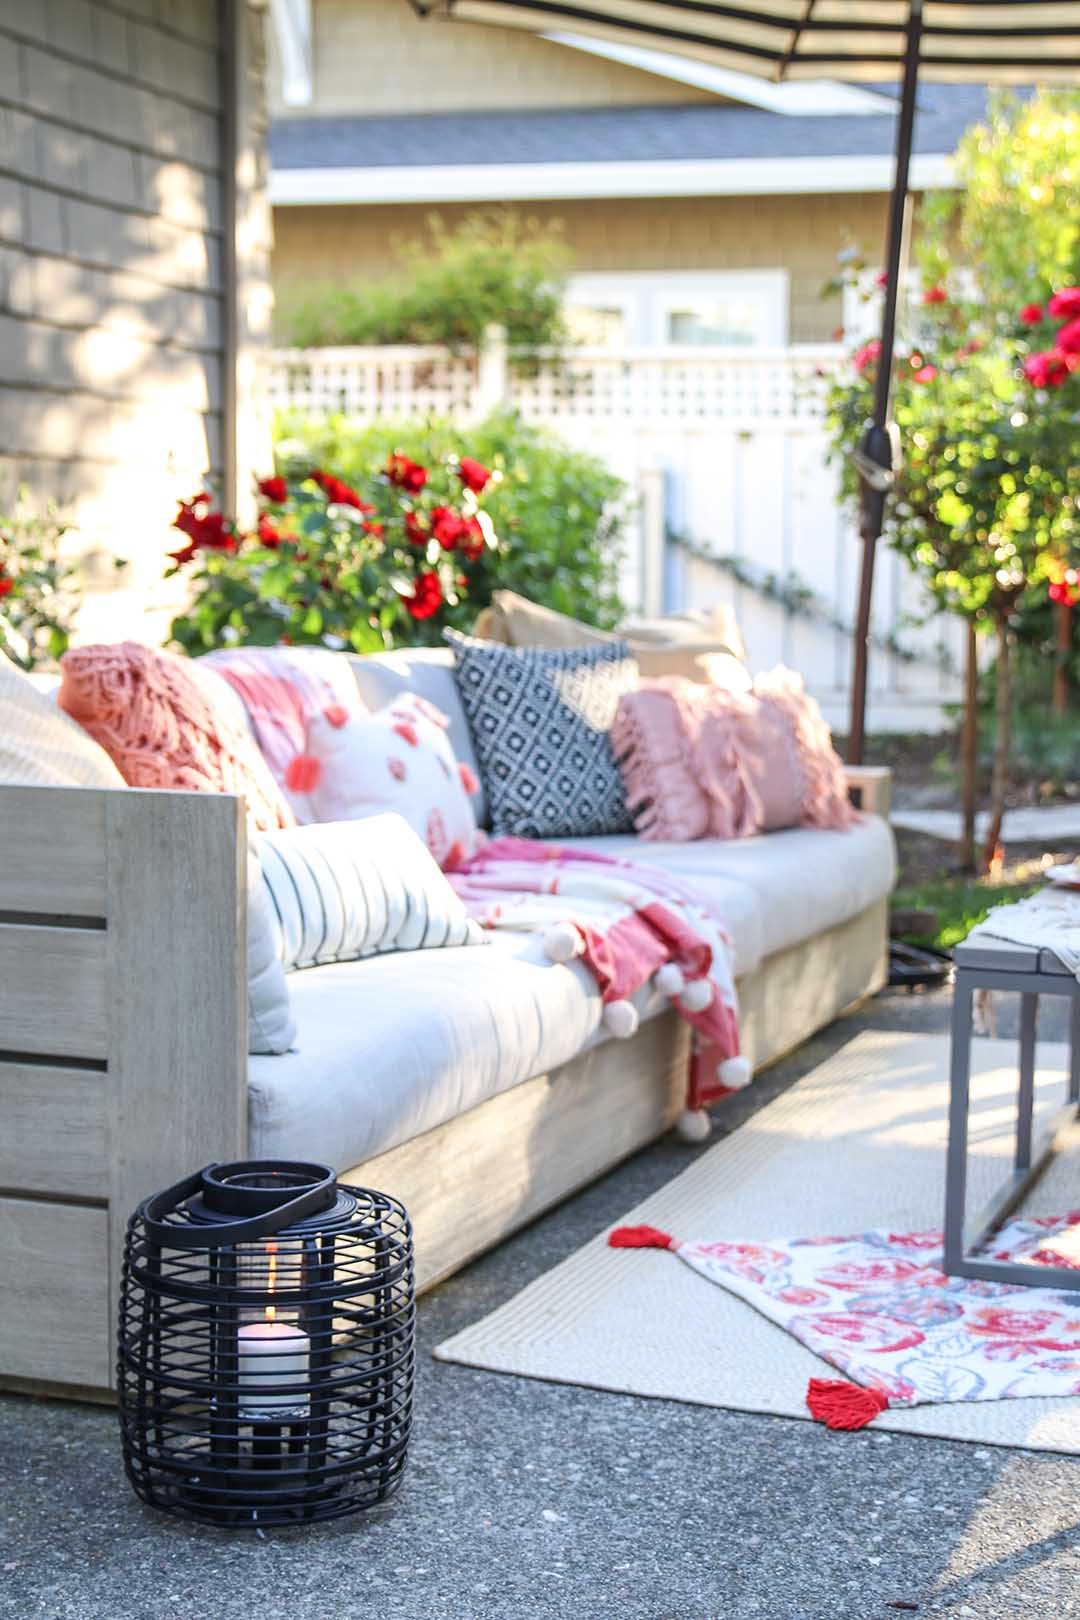 Patio Decorating Ideas: 7 Simple Summer Updates - Modern Glam on Basic Patio Ideas id=63764